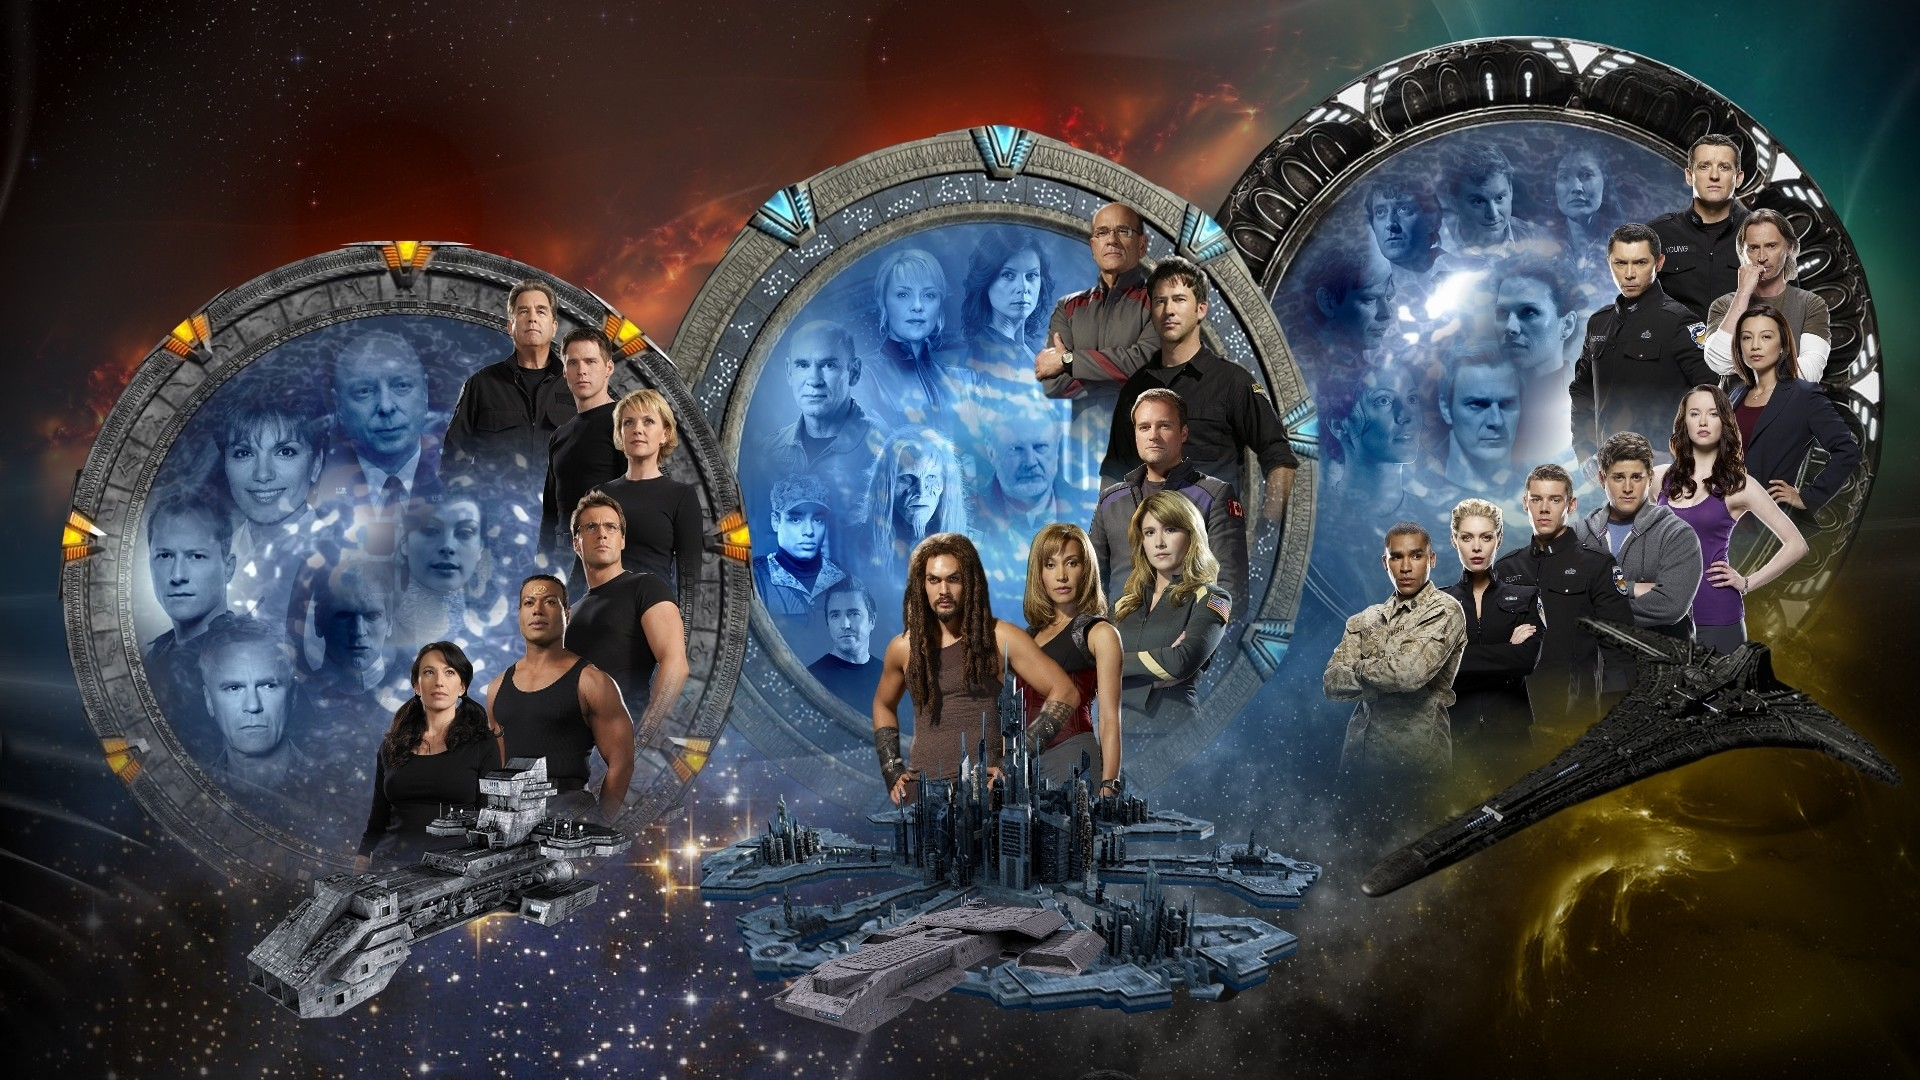 Stargate wallpapers - HD wallpaper